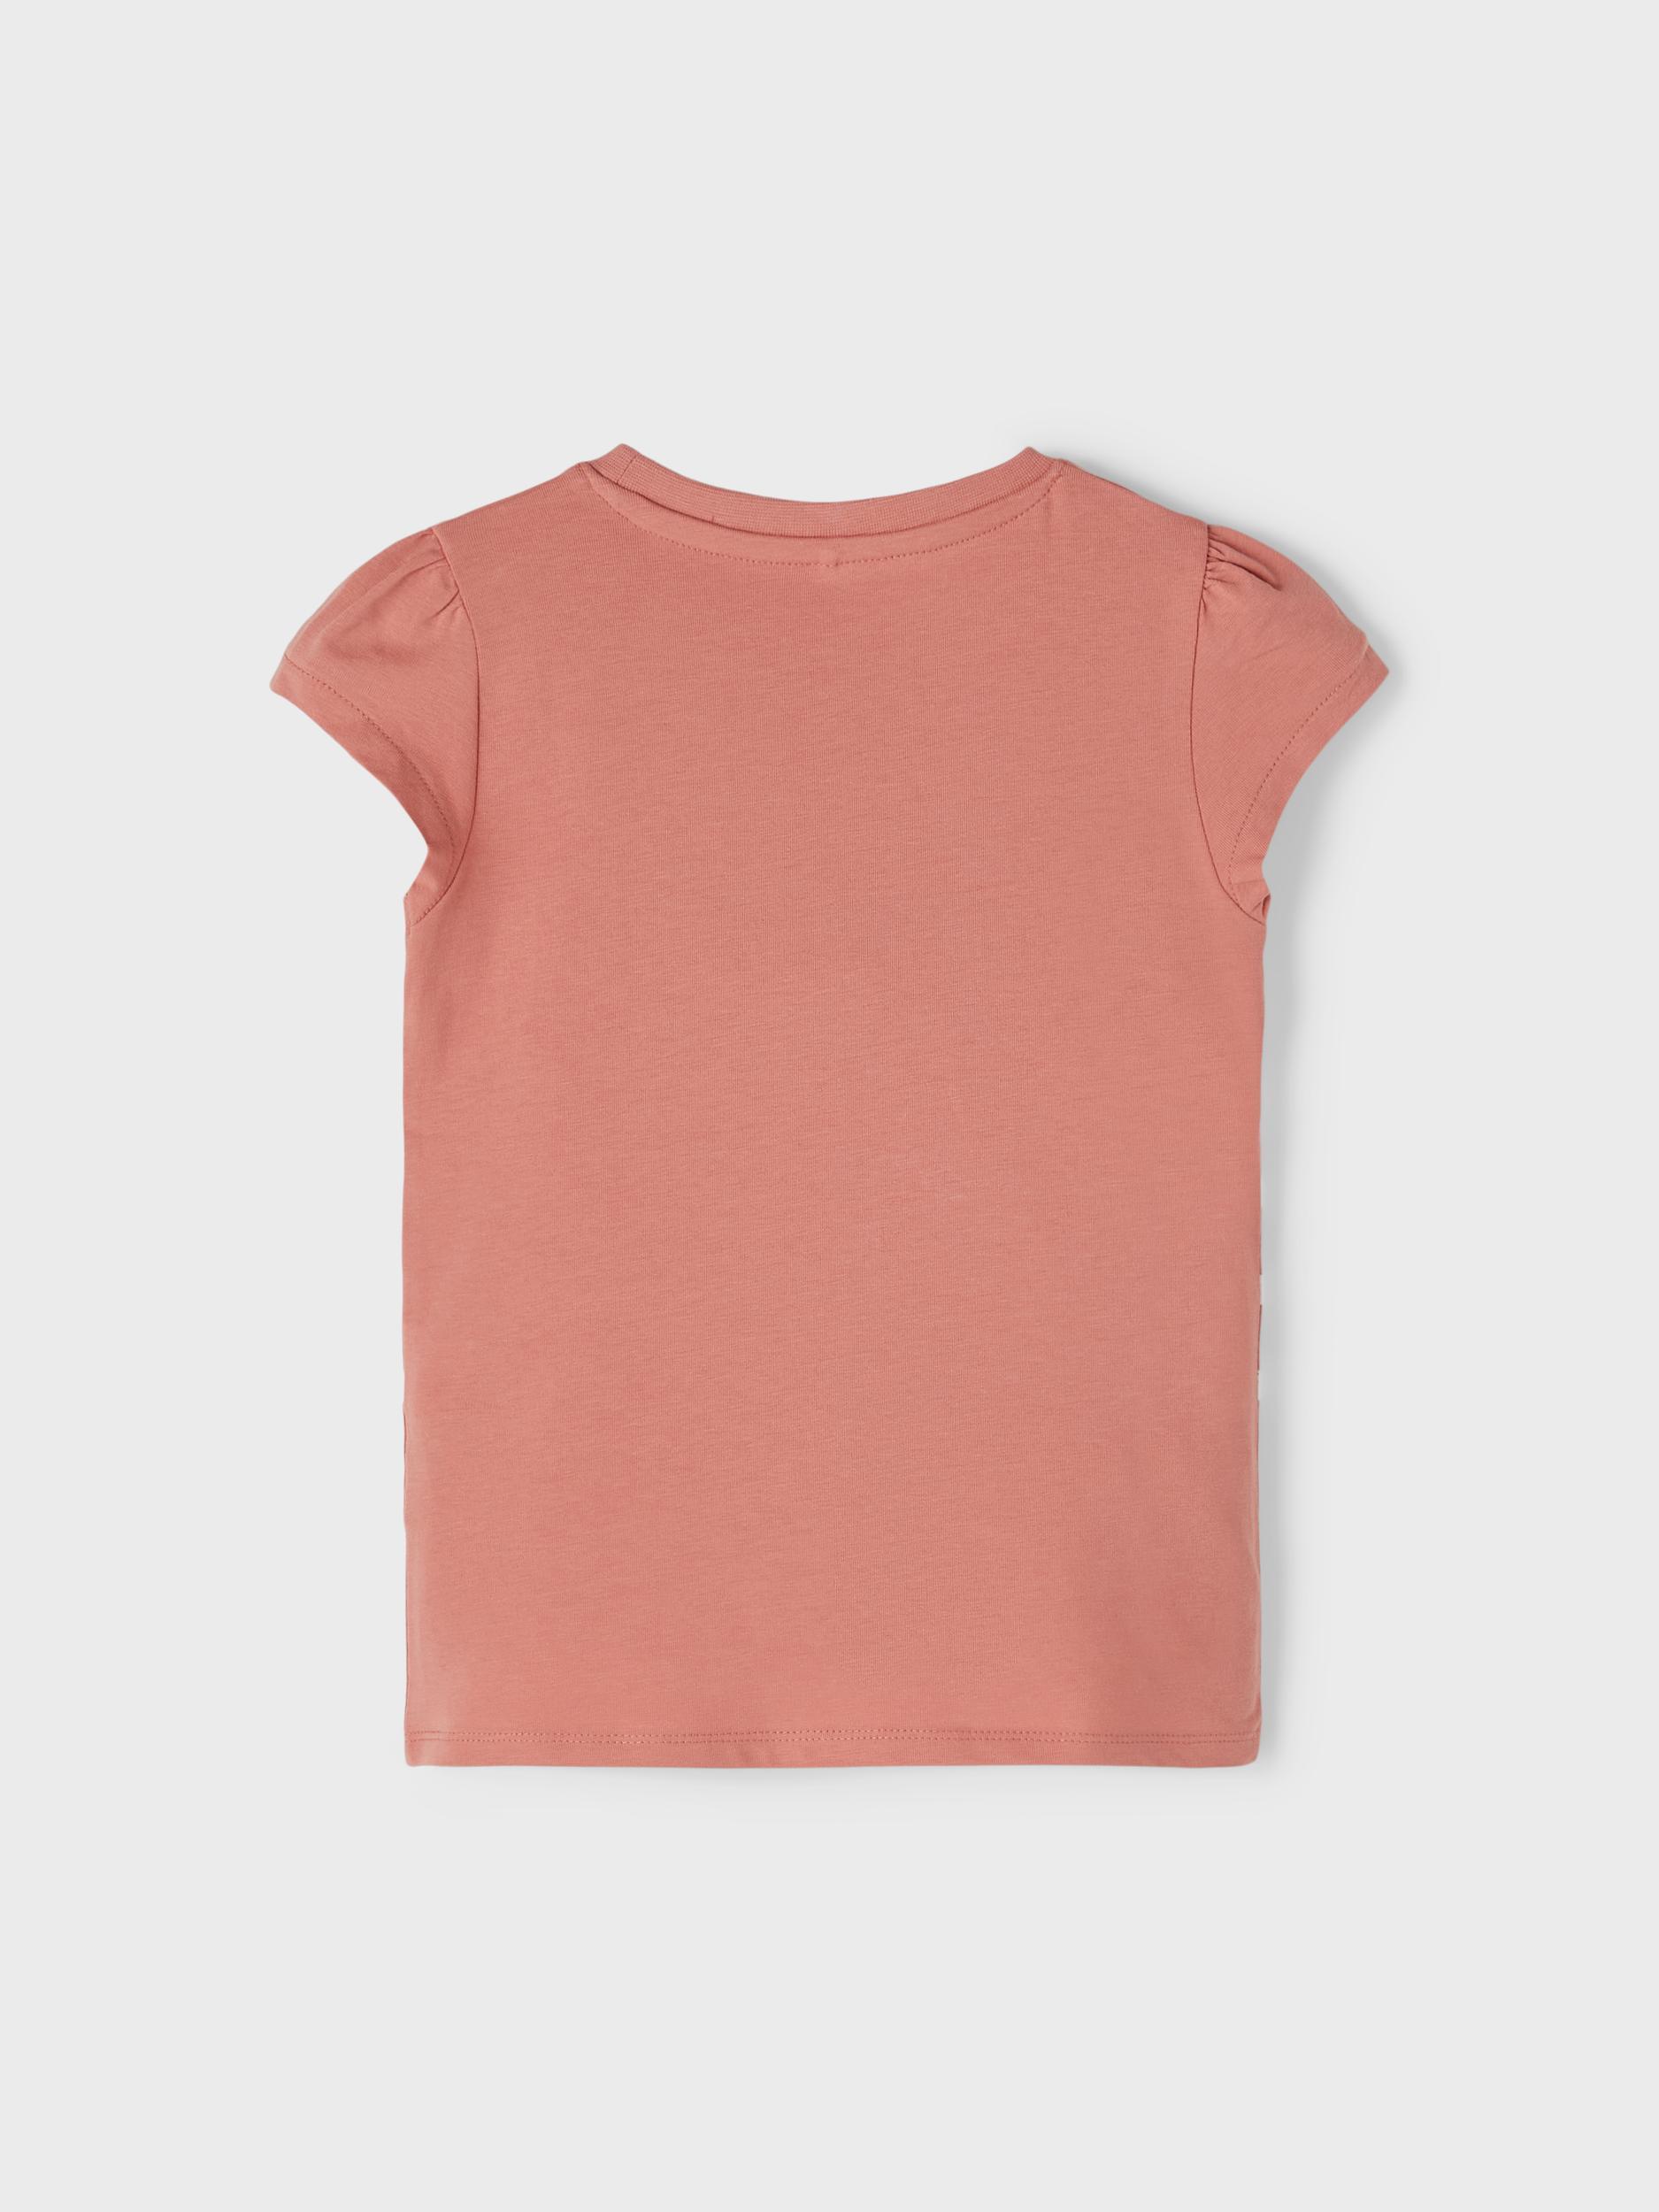 Name It Gurli Gris Rebate SS t-shirt, desert sand, 98